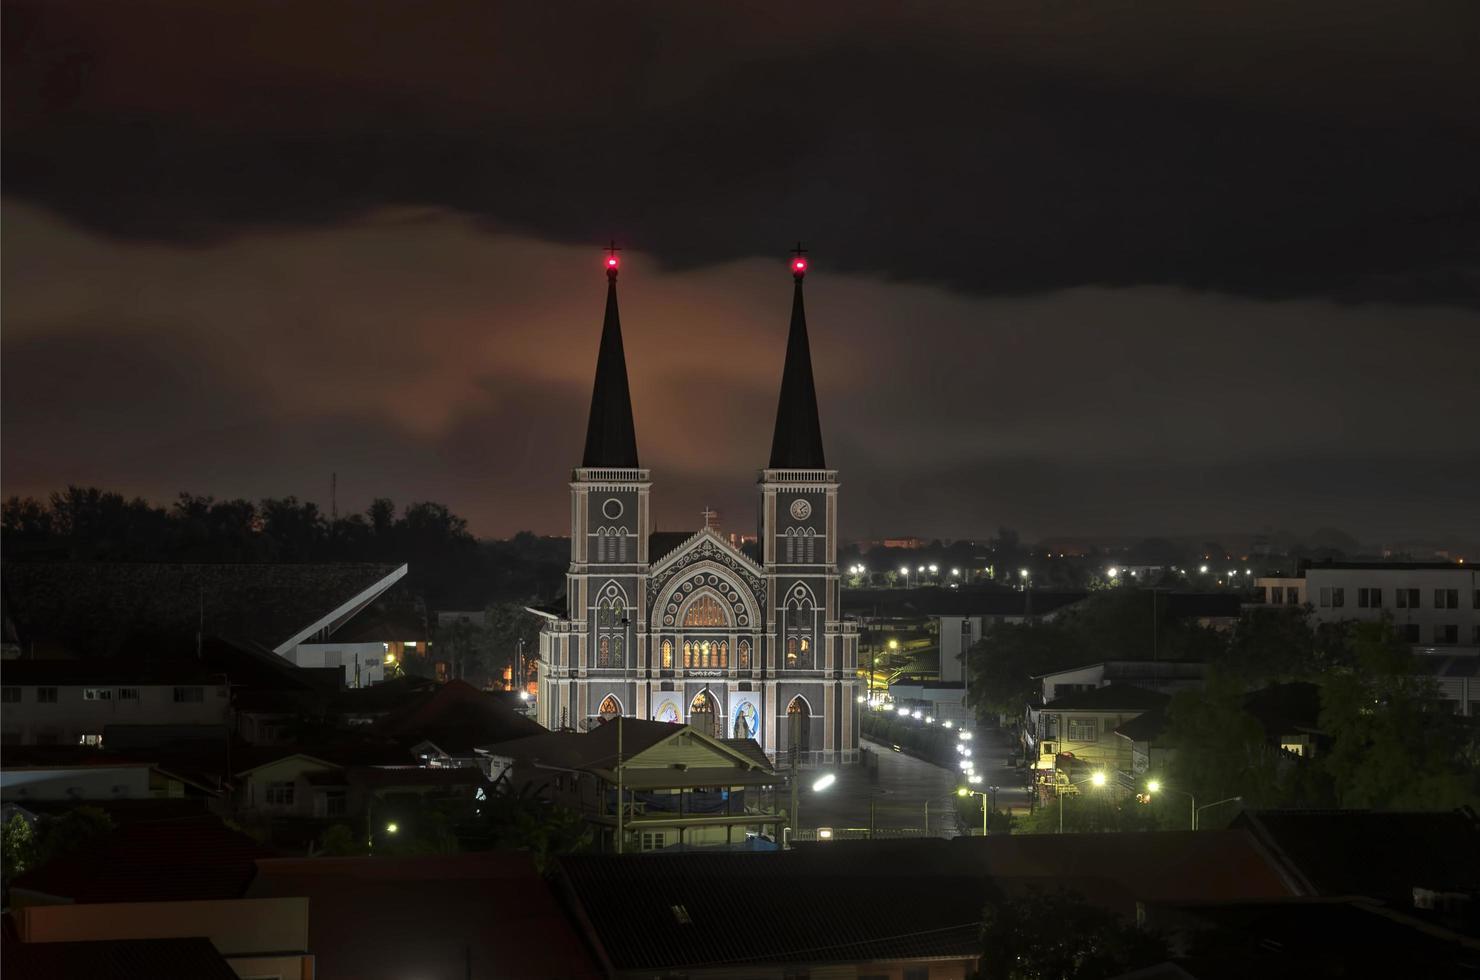 katolsk kyrka på natten i Thailand foto